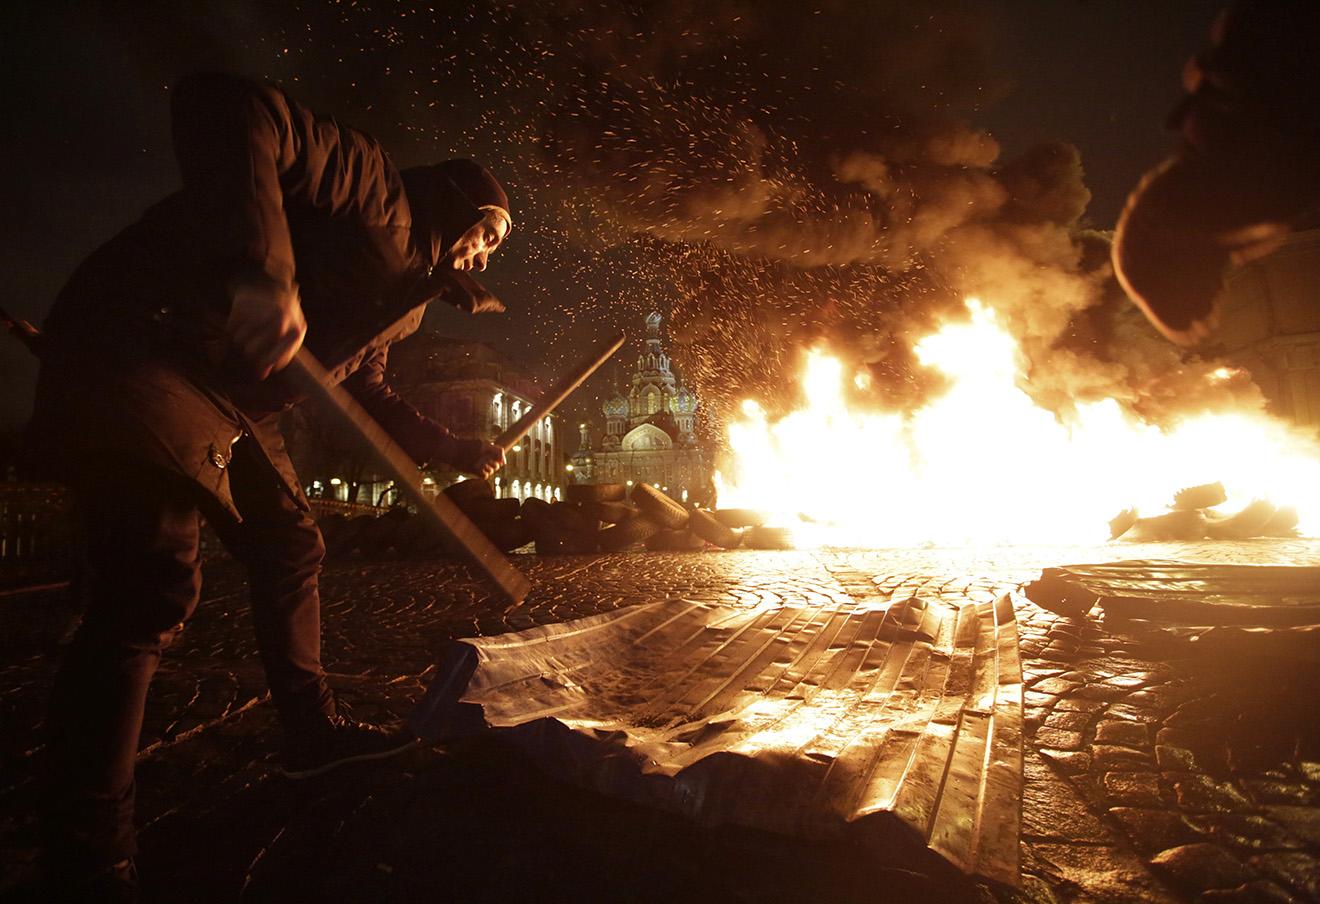 Петр Павленский на акции «Свобода». Фото: Maxim Zmeyev / Reuters